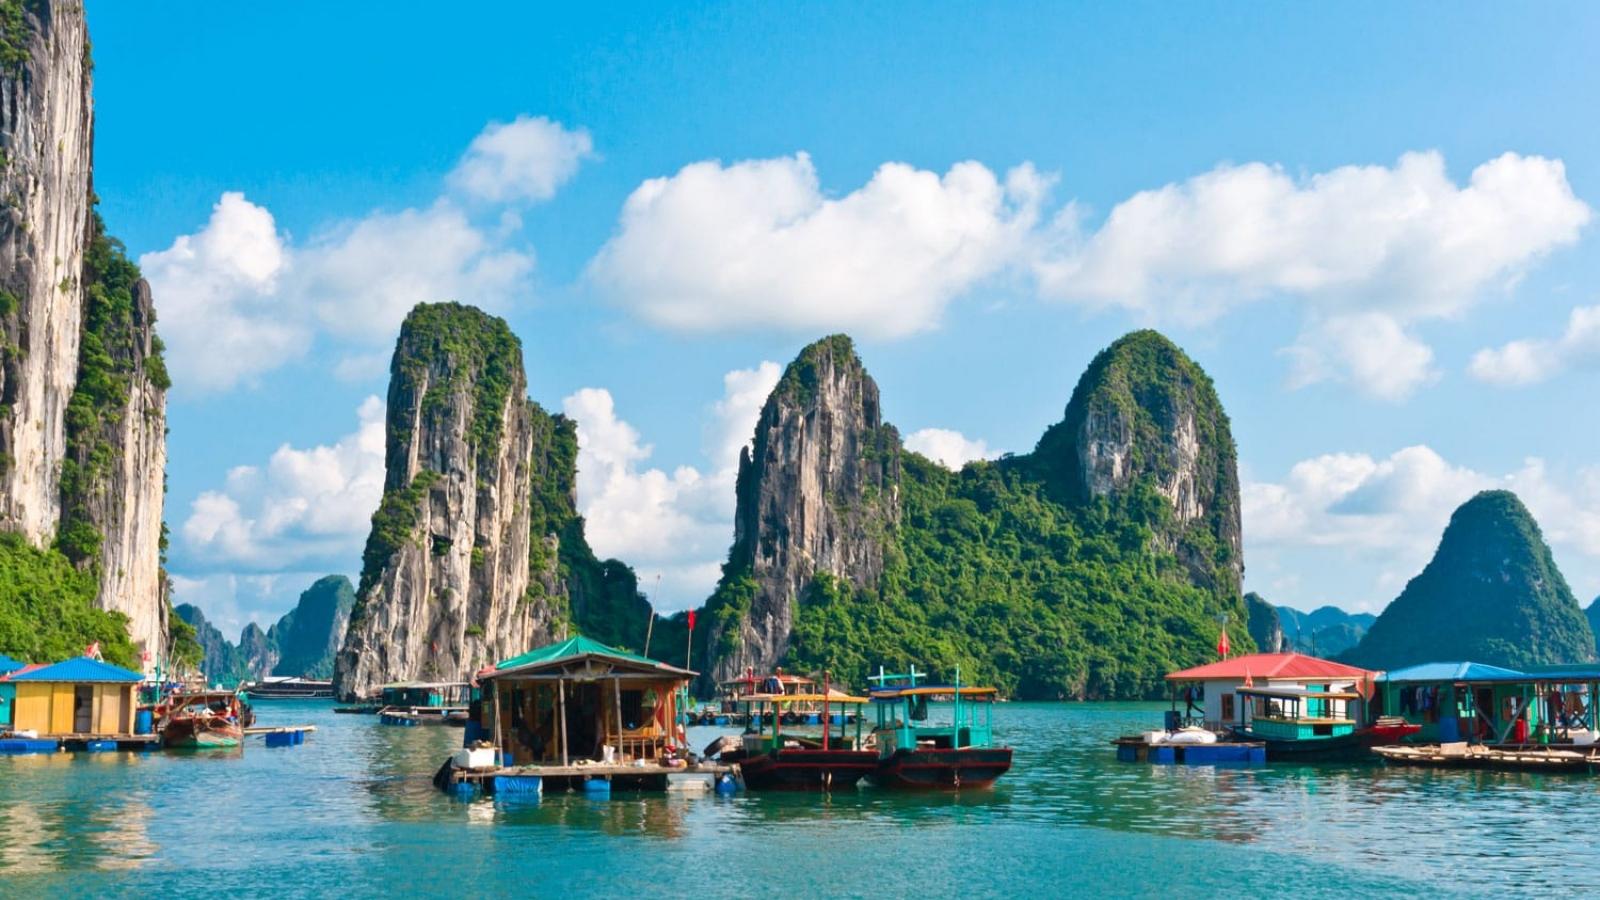 Cua Van of Quang Ninh among world's top 25 most beautiful villages